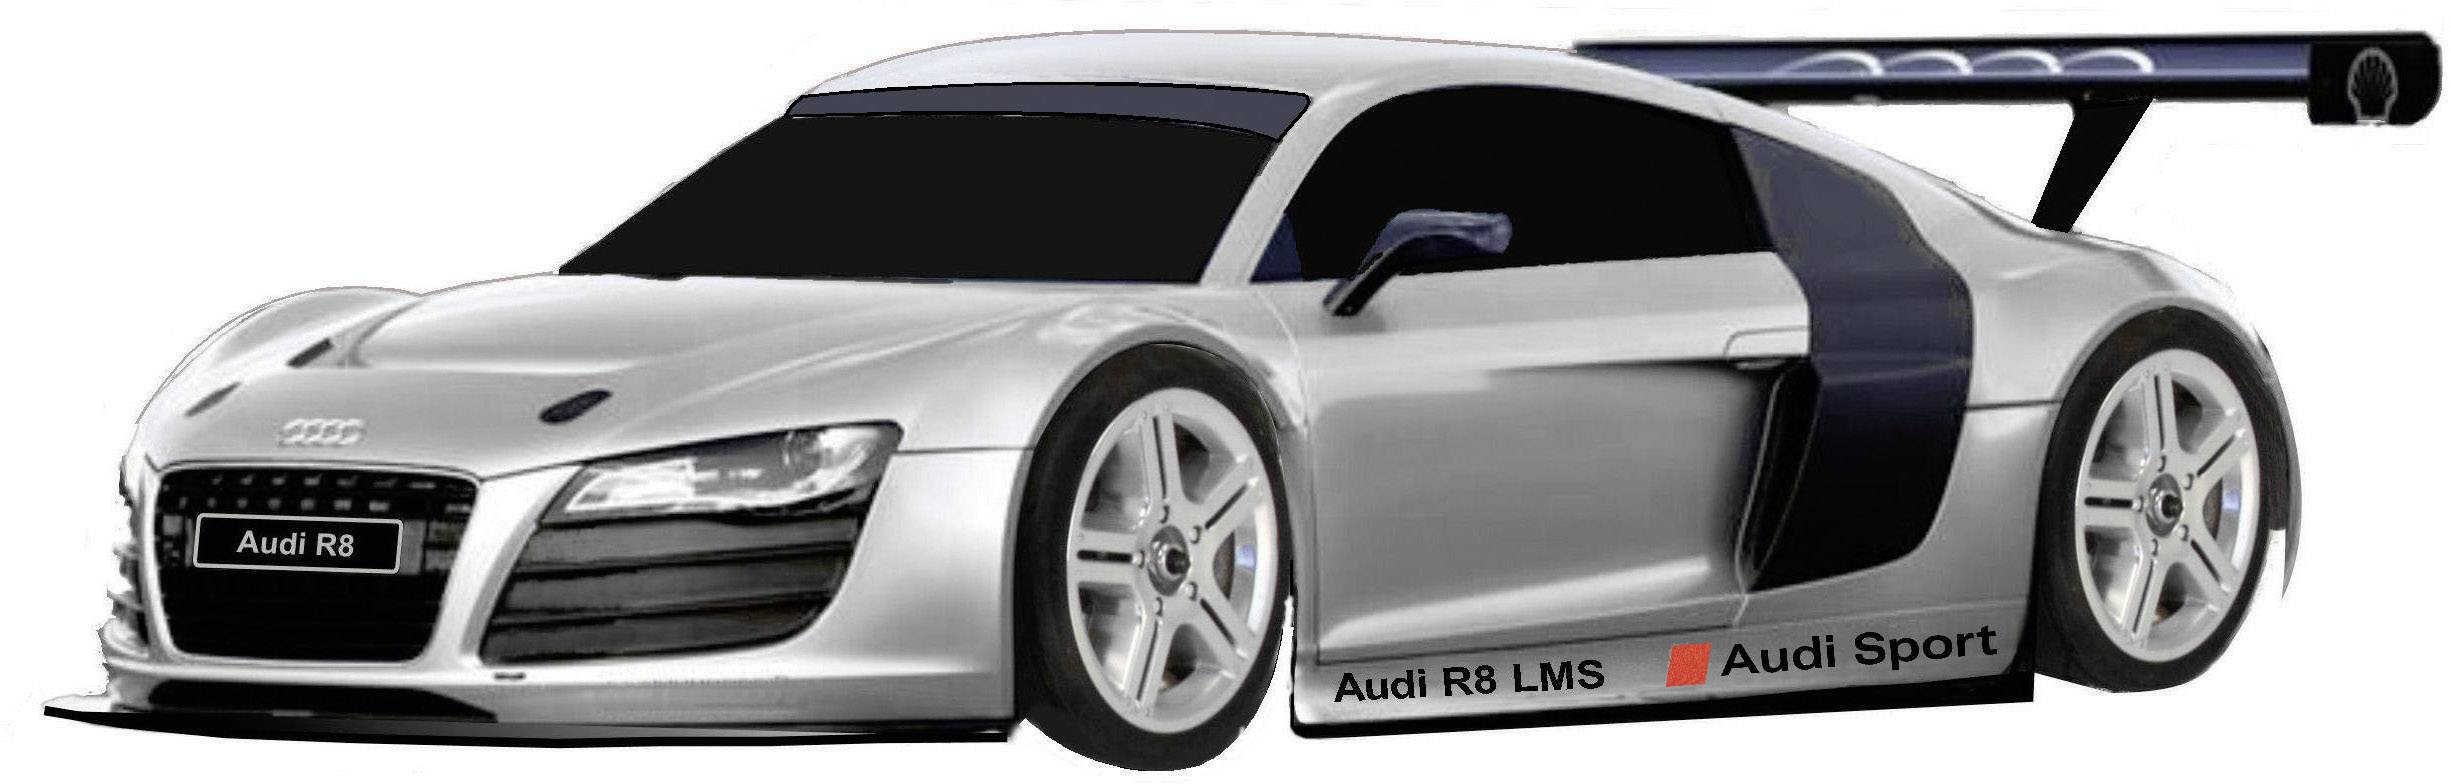 Karoséria Reely Audi R8 LMS 237993 1:10, lakovaná a polepená